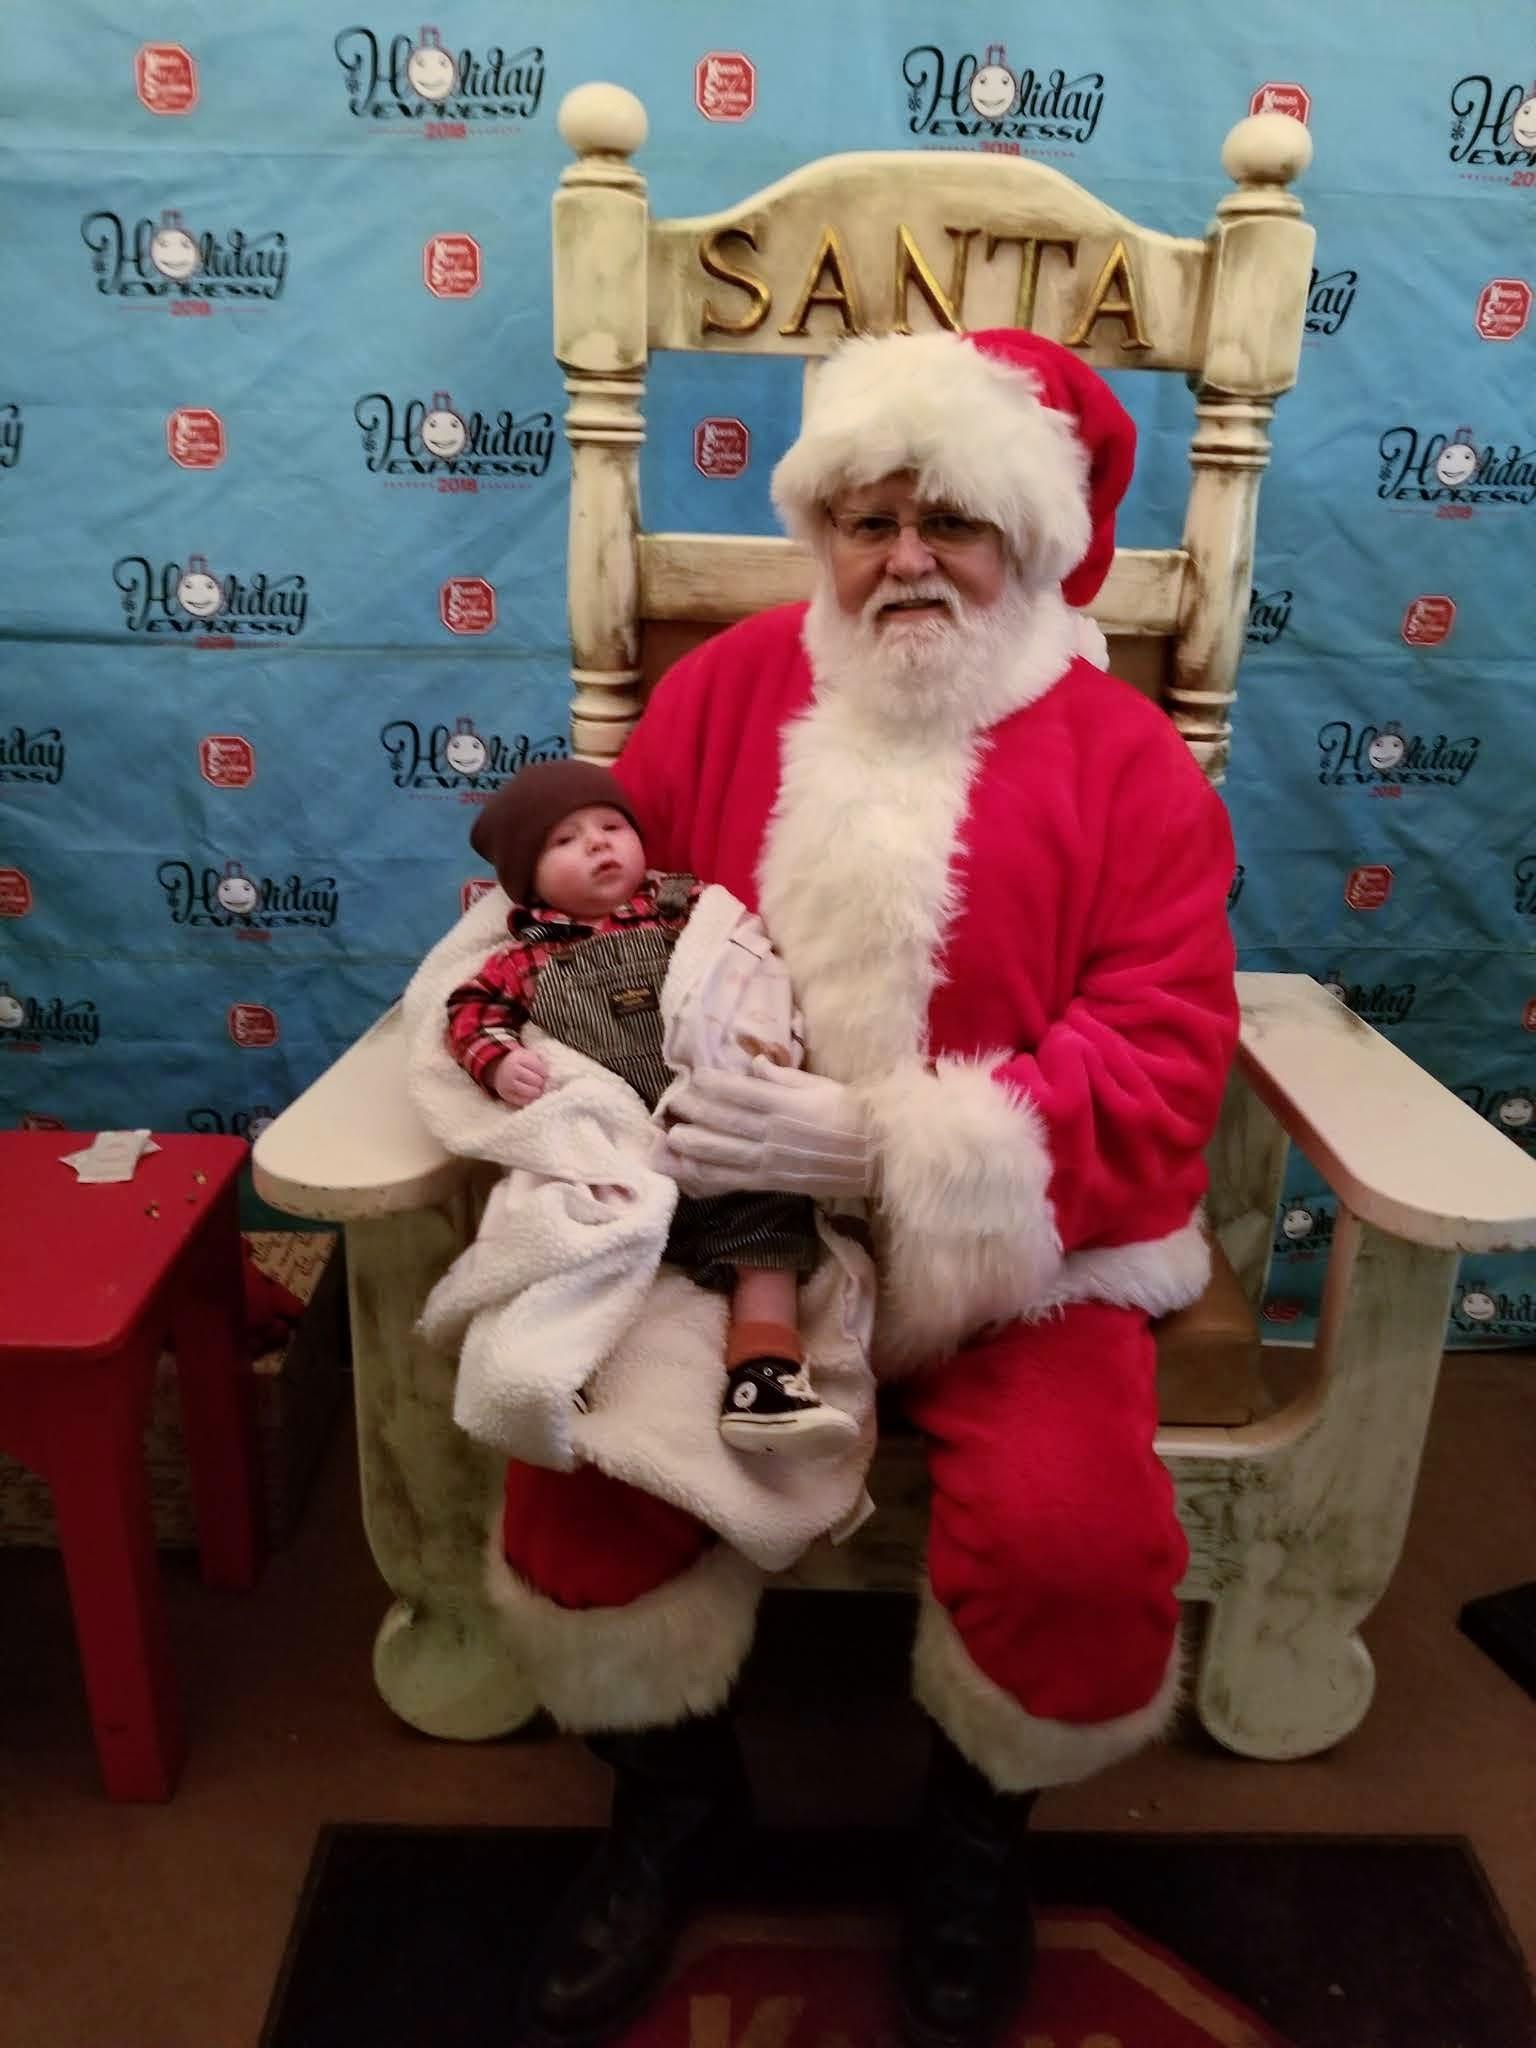 Kimberly Aker Photography   Bossier City Boudoir & Lifestyle Portrait Photographer  Shreveport Boudoir & Lifestyle Portrait Photographer   New Christmas Traditions with Floyd